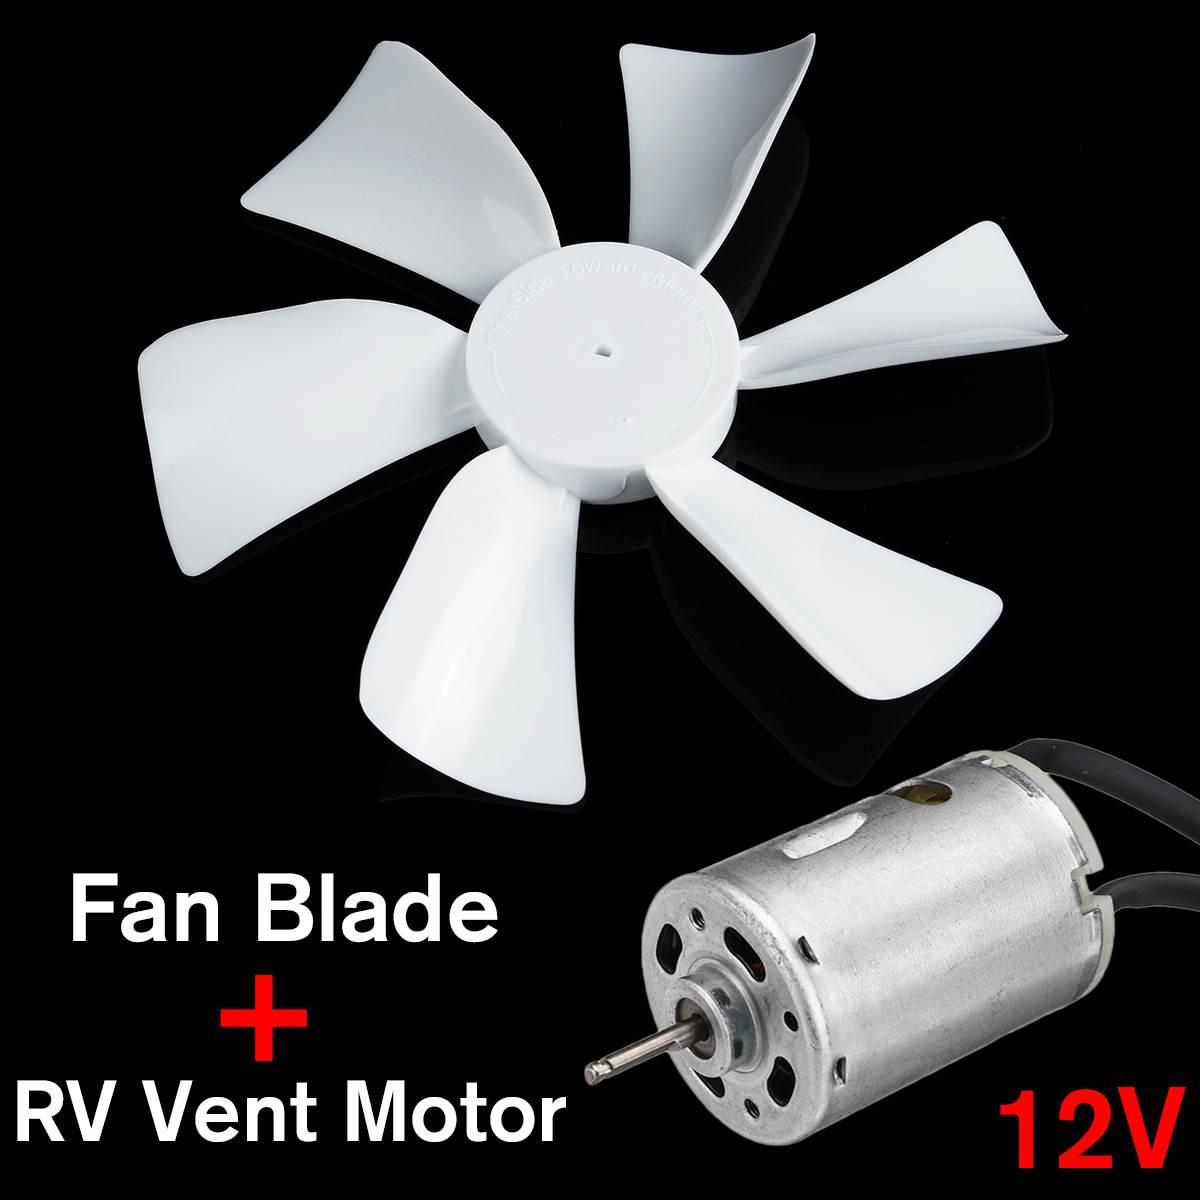 1SET 12V RV Energy-saving Motorhome Roof Vent Ventilation Cooling Exhaust Fan +Motor Noiseless For Travel Motor Homes